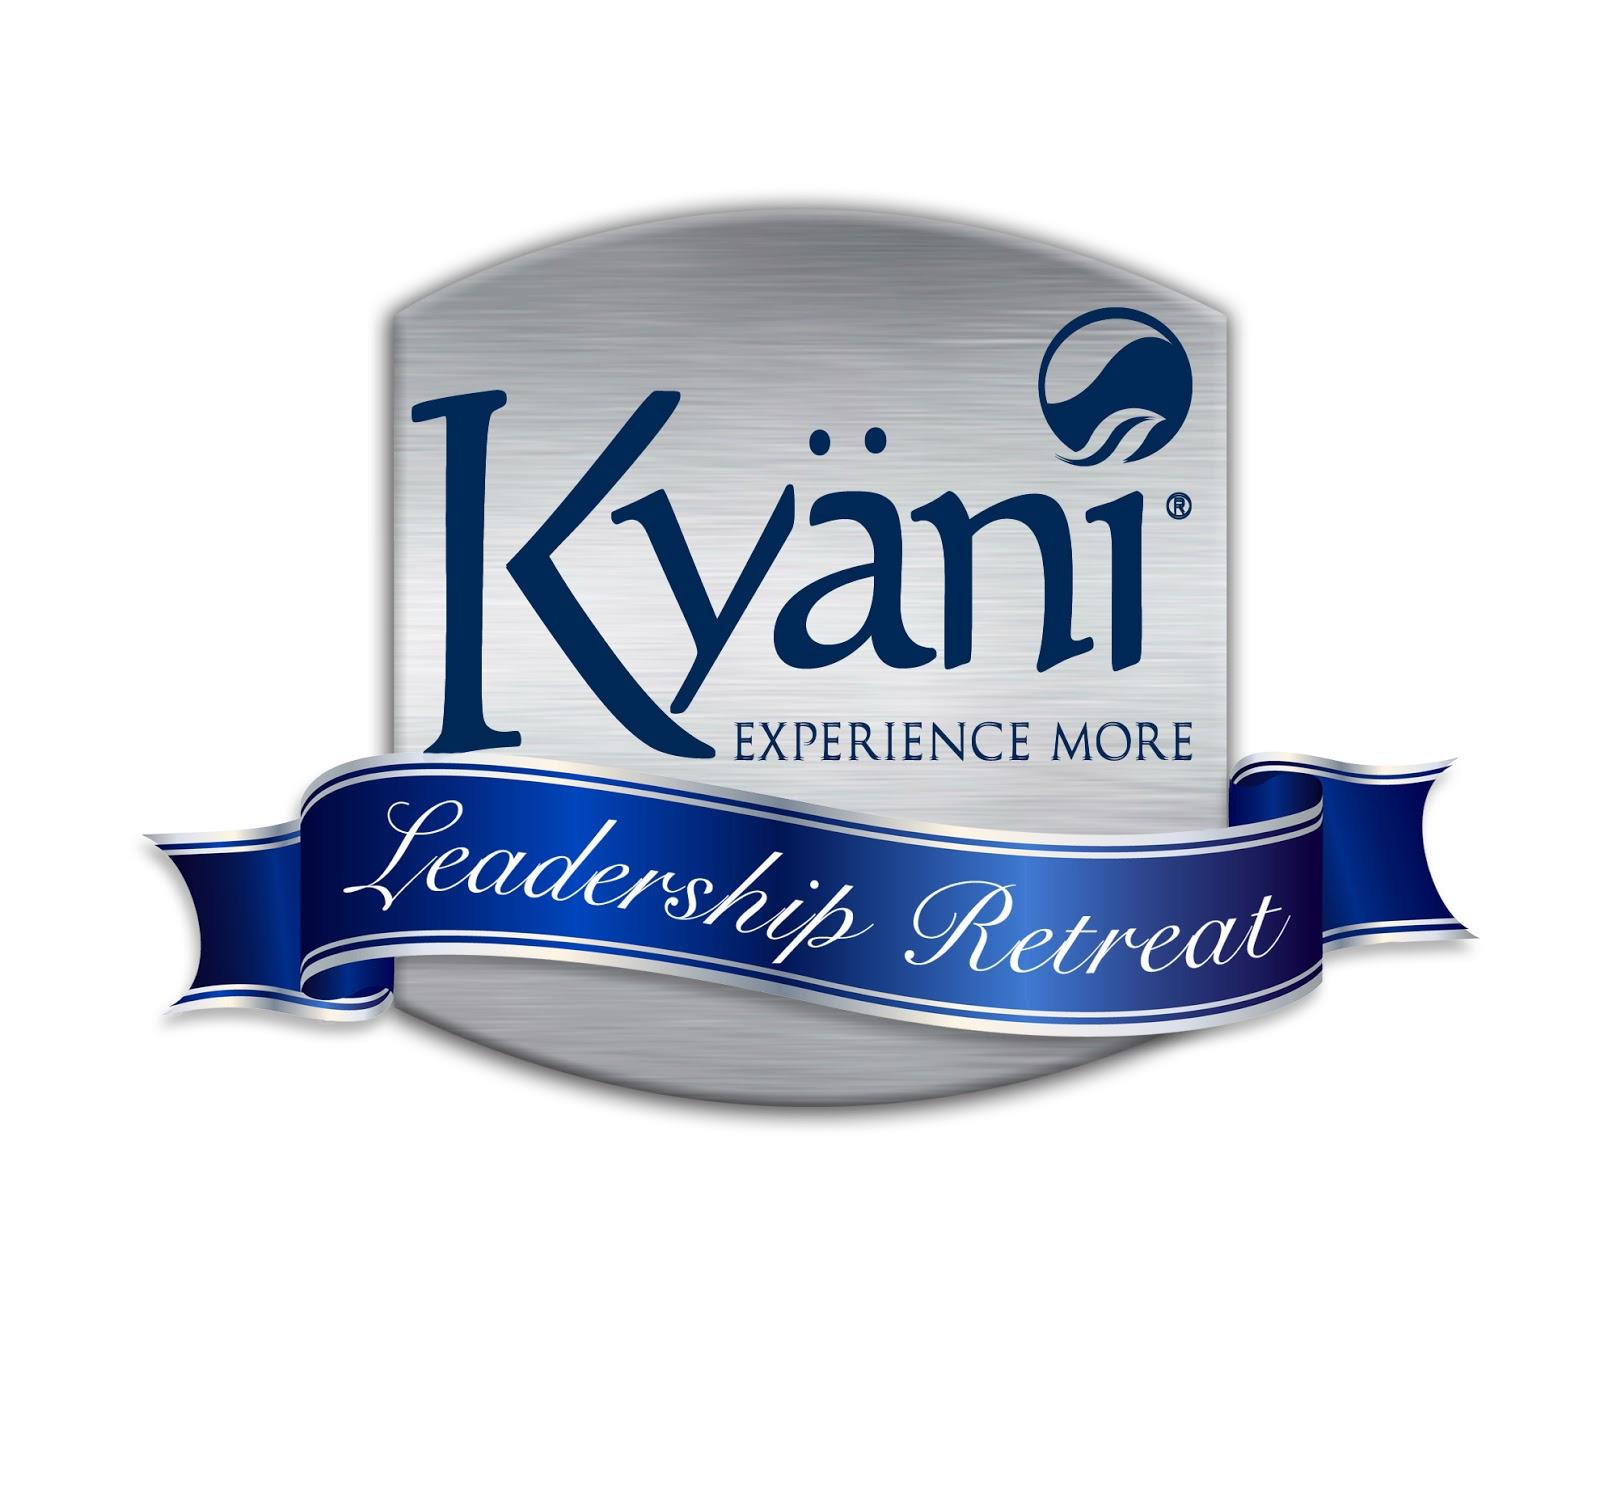 Kyani Philippines Independent Distributor Homepage